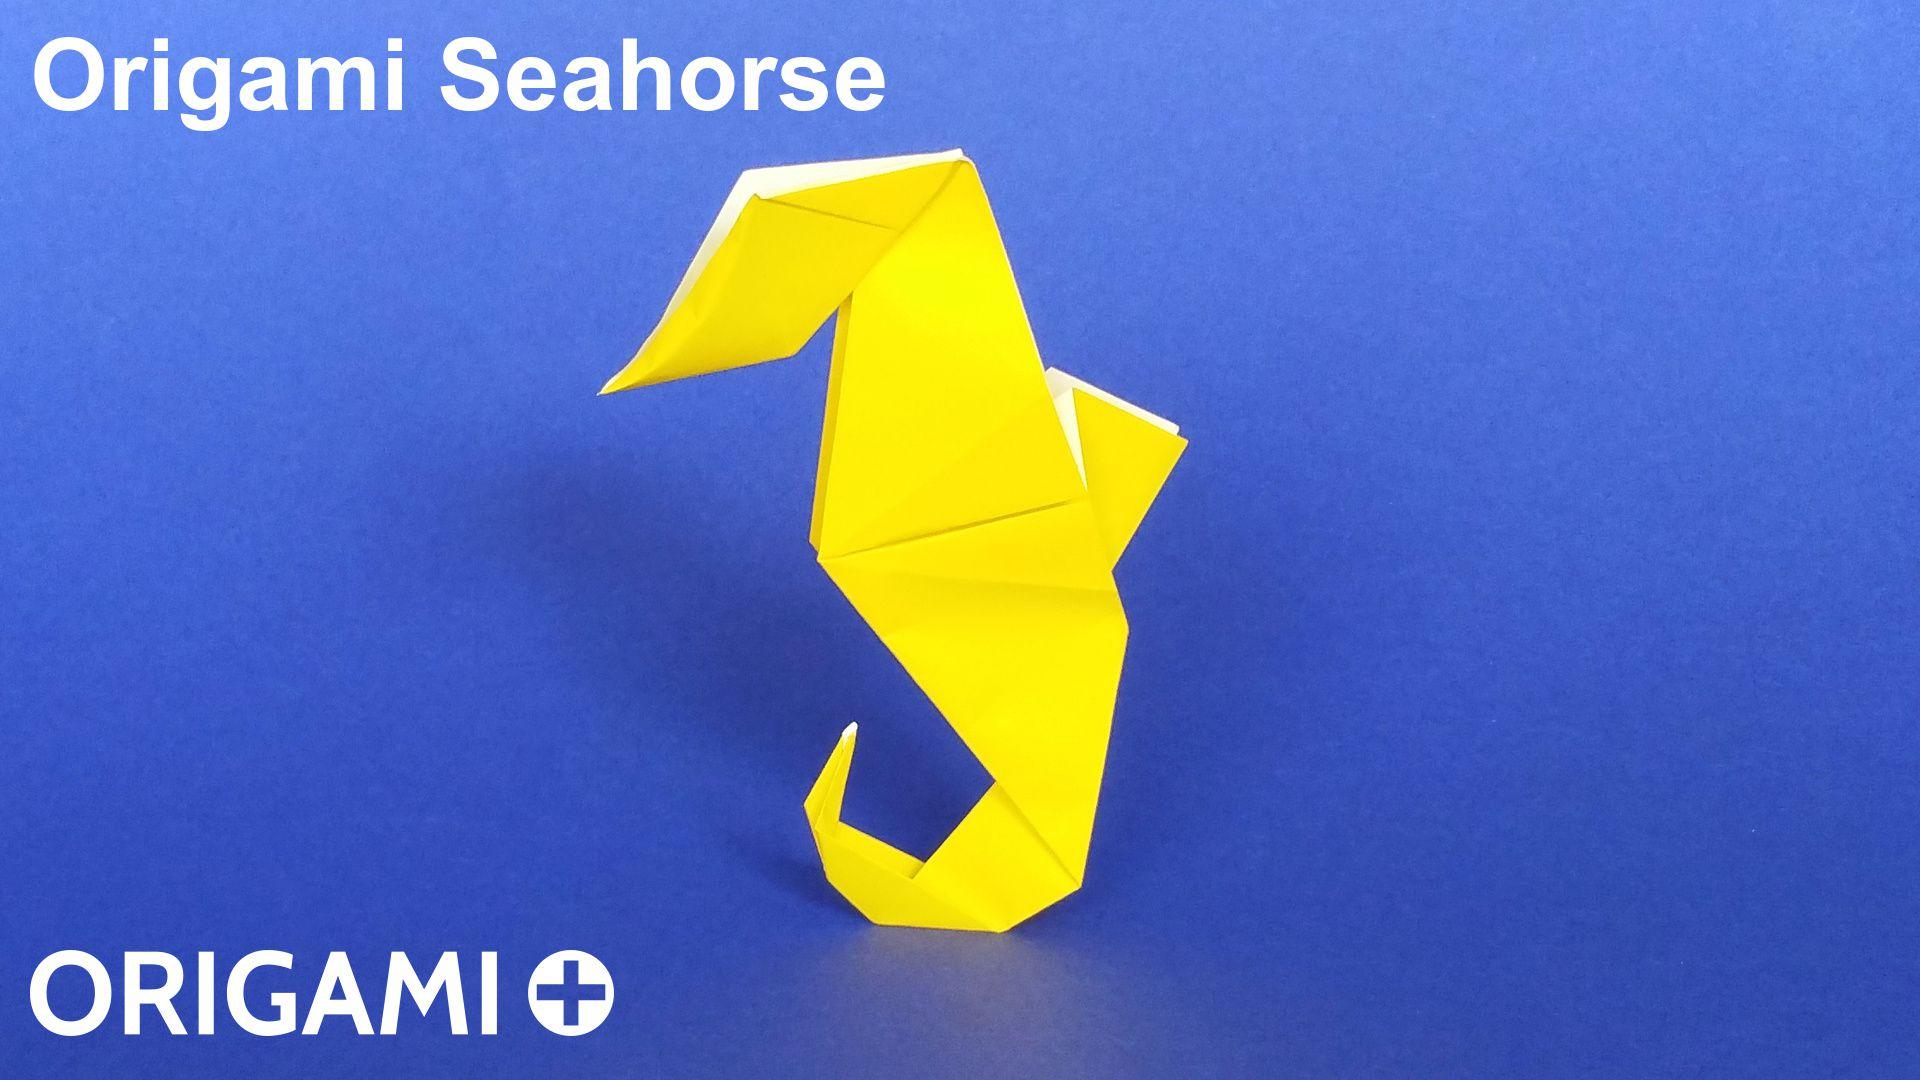 Origami seahorse instructions youtube - Origami Seahorse